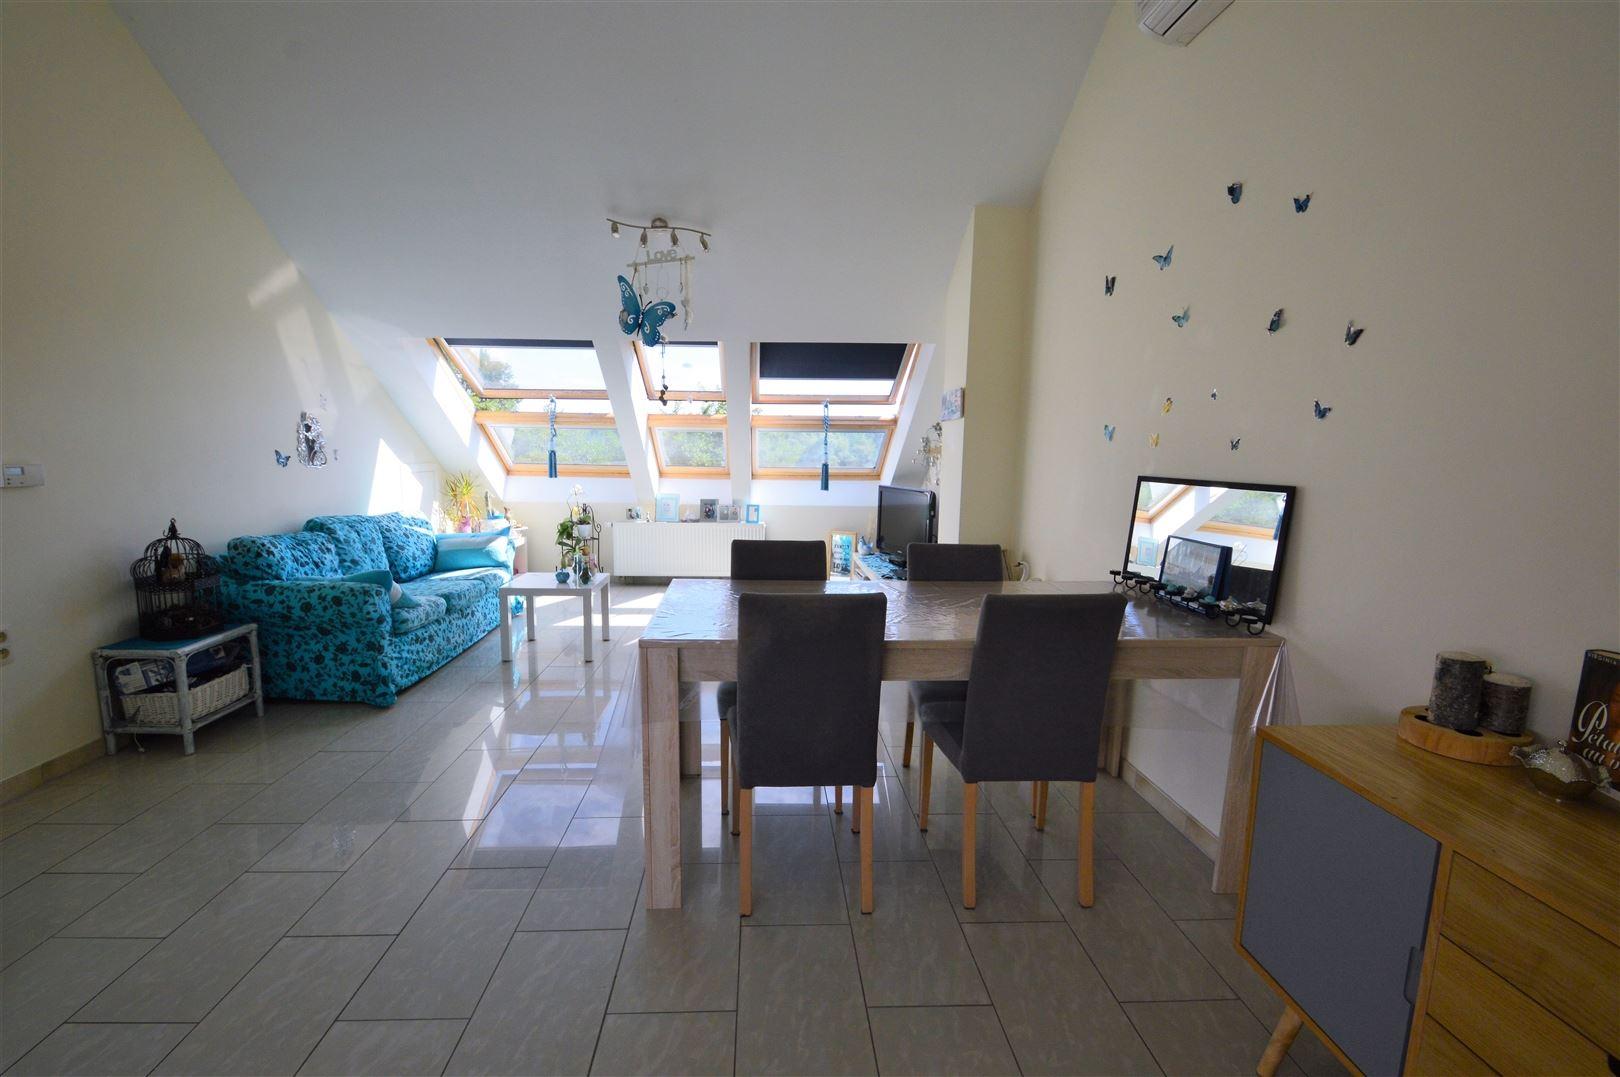 Foto 2 : Appartement te  BAASRODE (België) - Prijs € 495